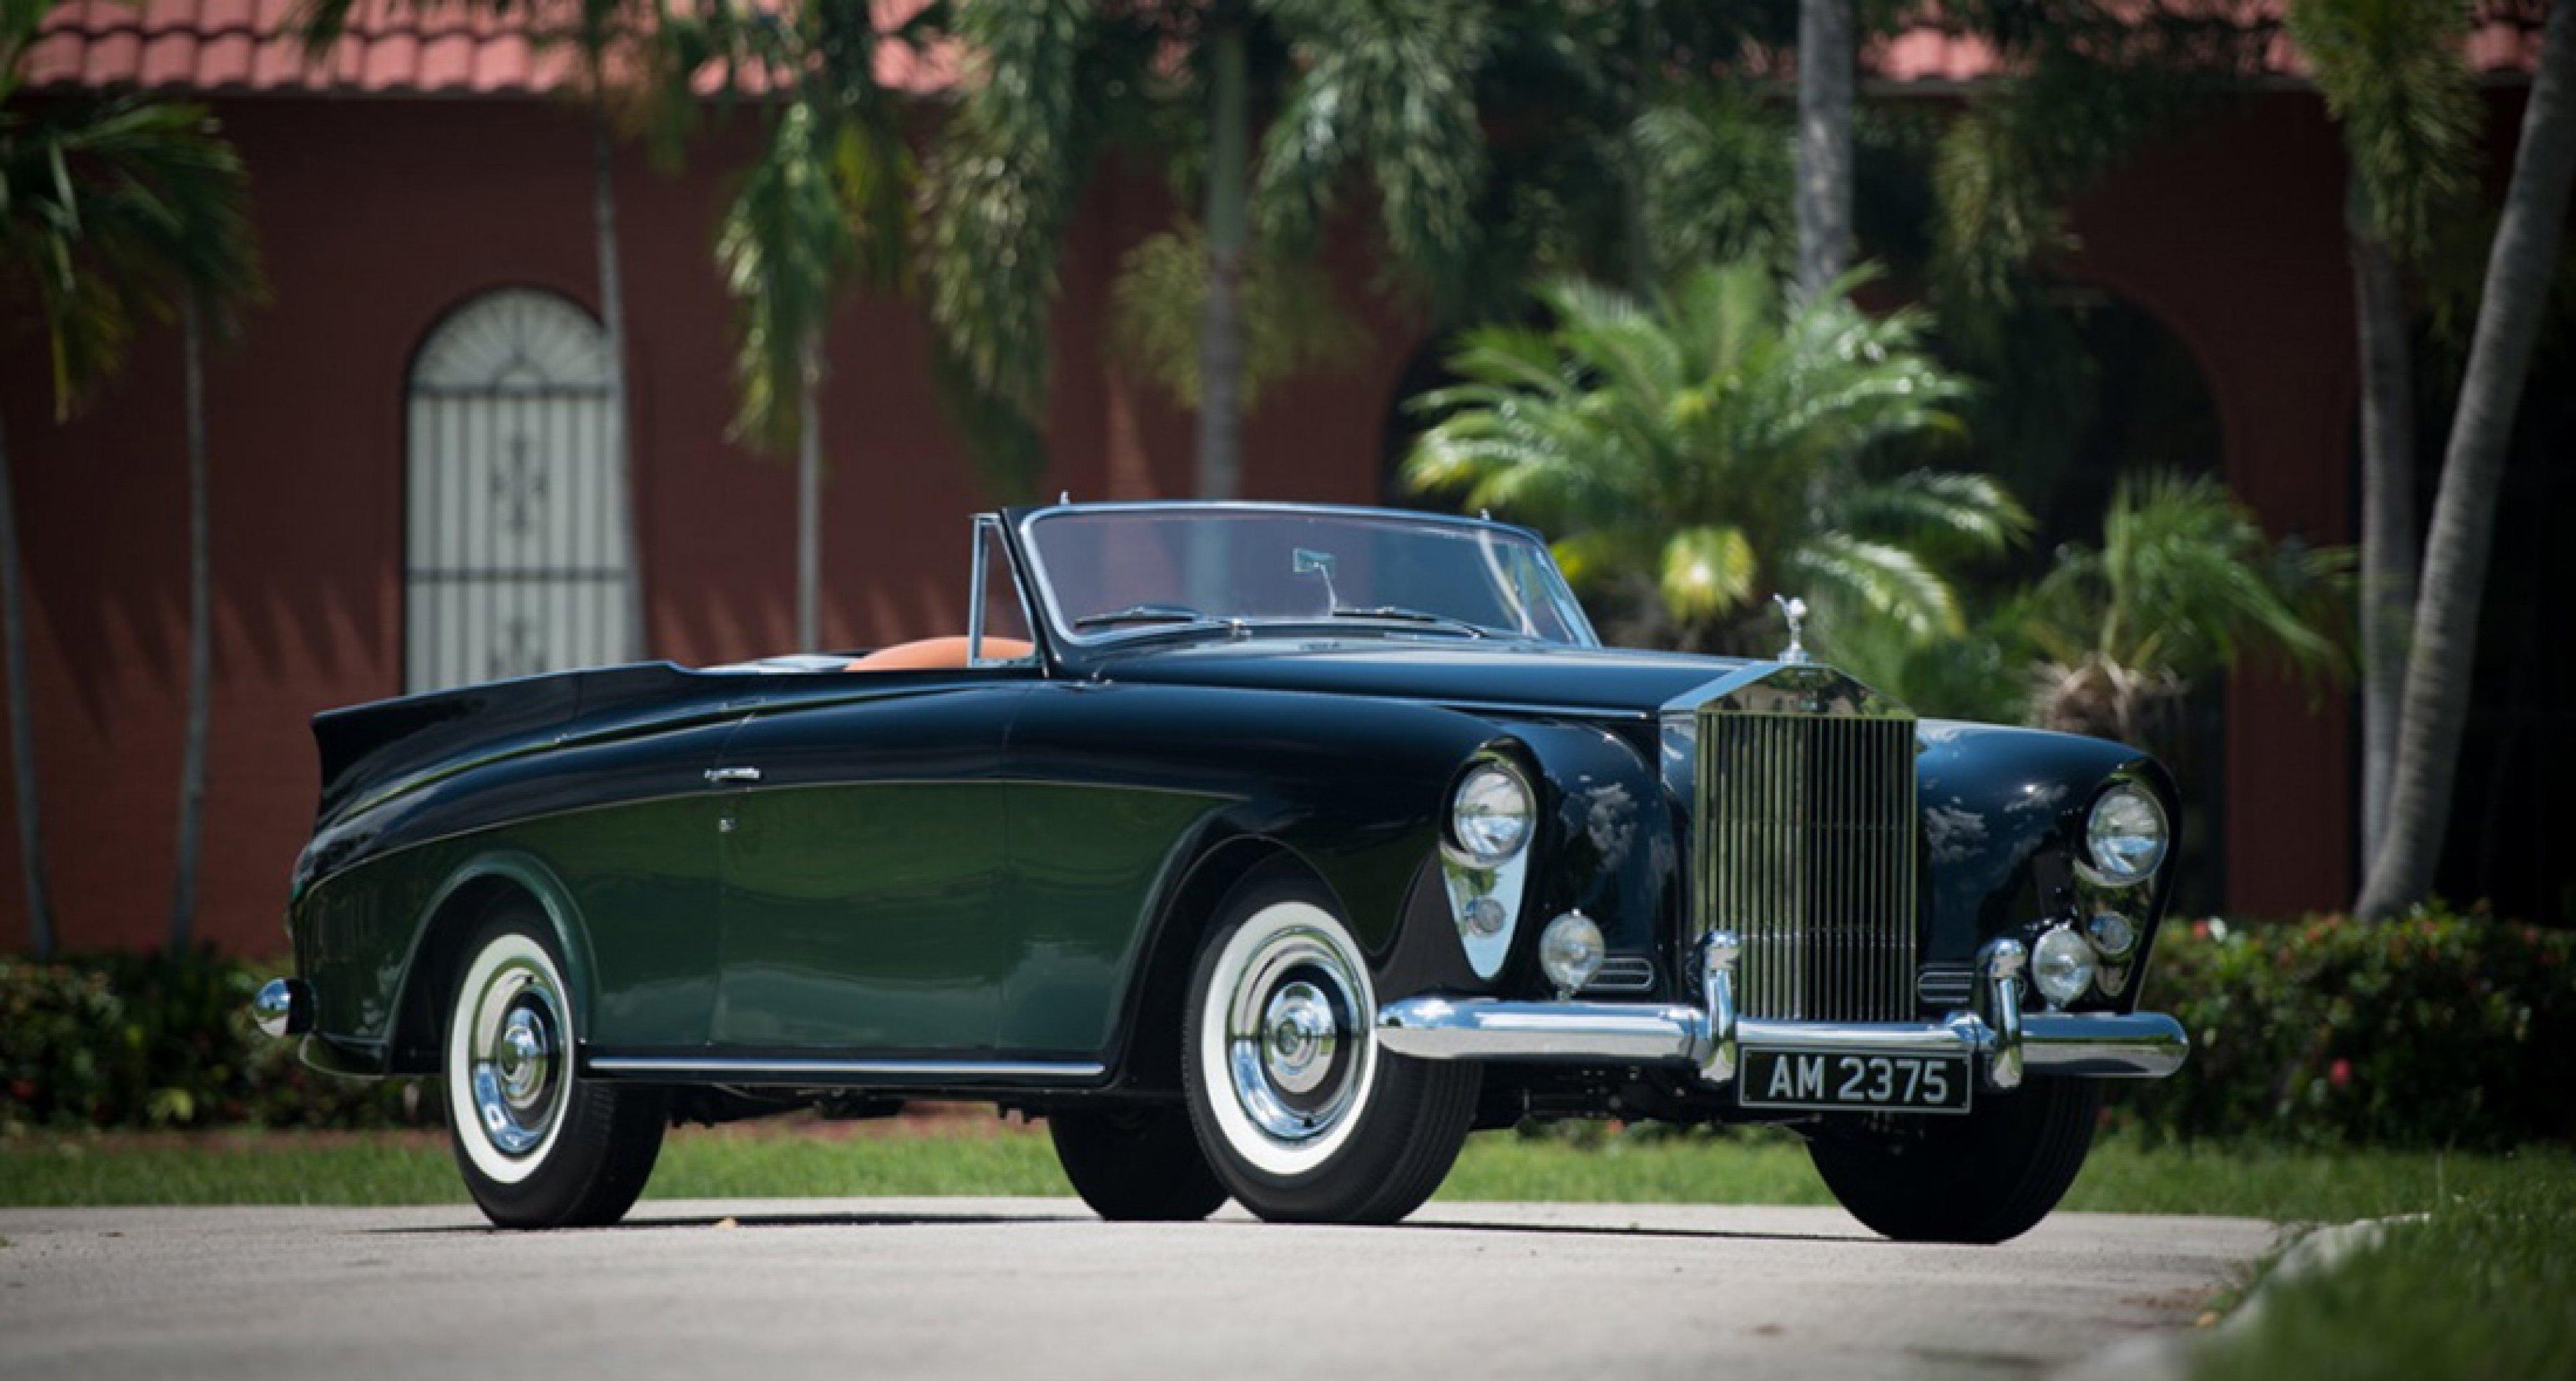 Rolls-Royce Silver Cloud 'Honeymoon Express'